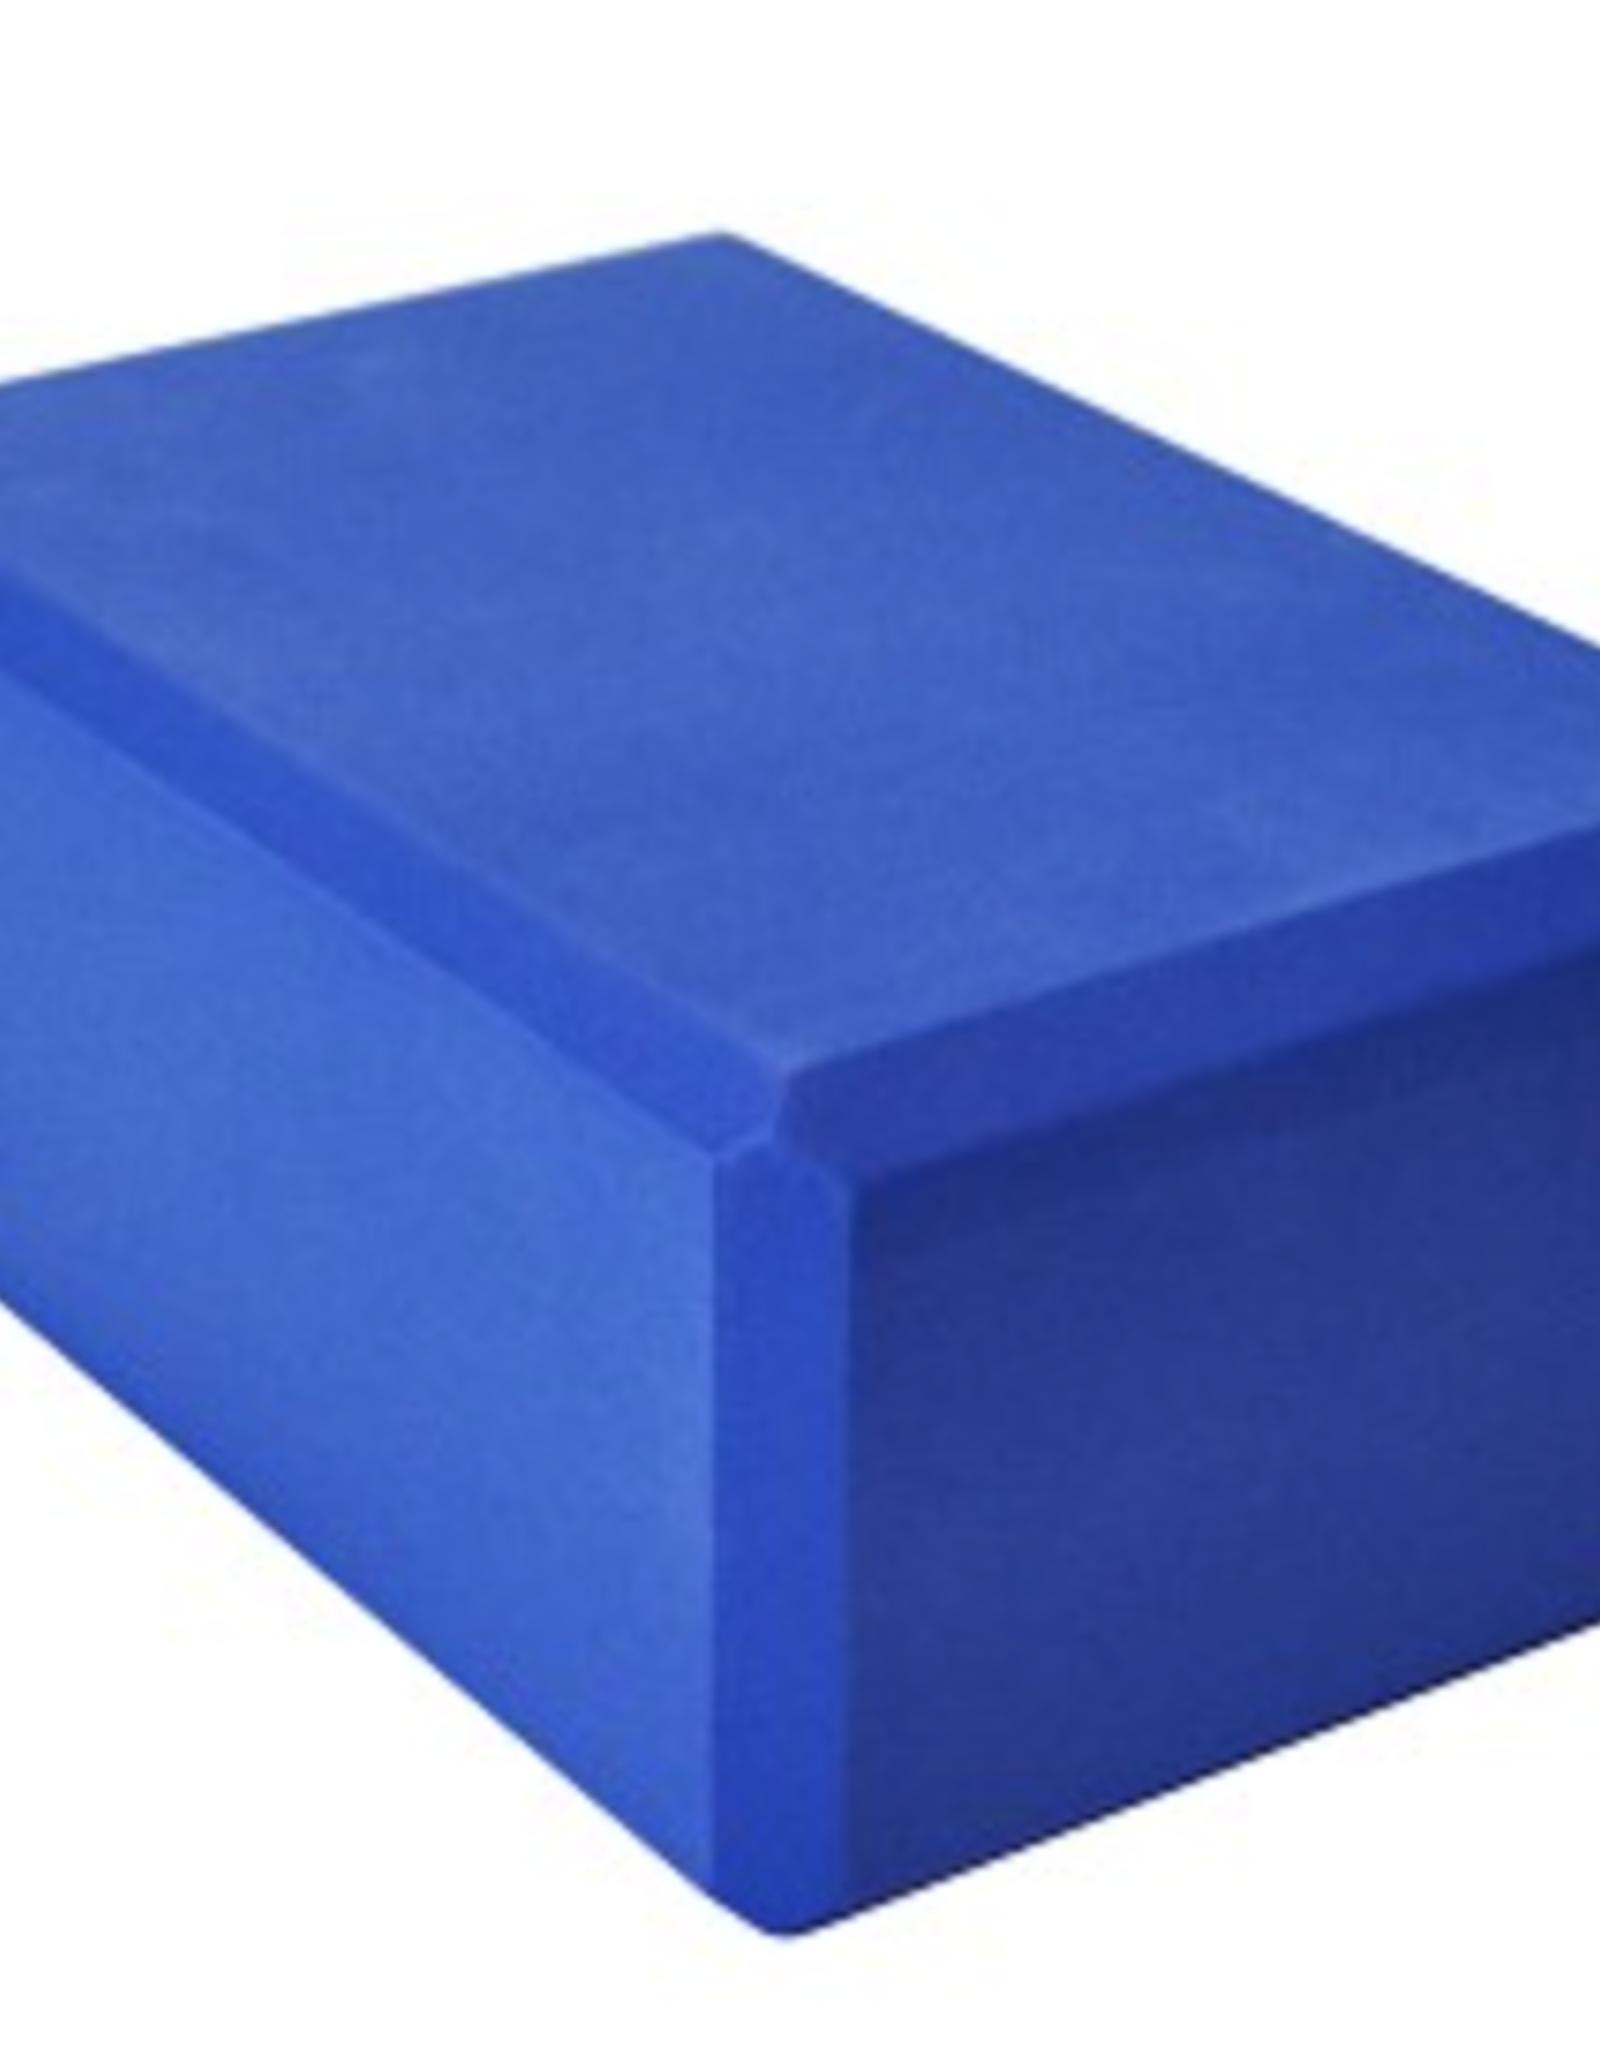 "Yoga Accessories 4"" Yoga Foam Block - Blue"